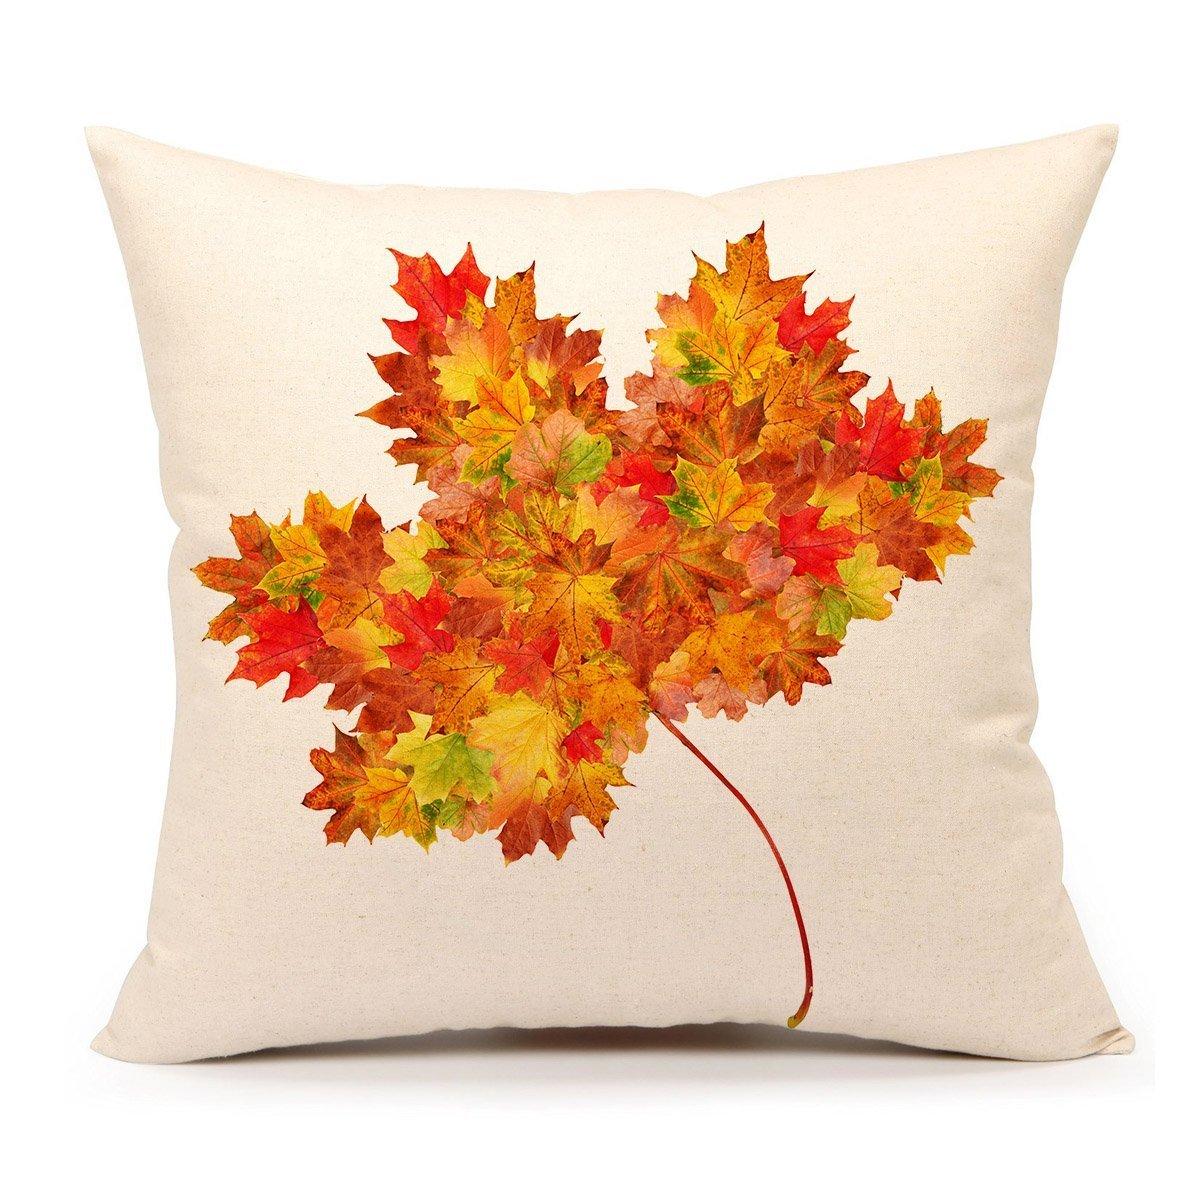 spxubz Pumpkin Spice Fall Halloween枕カバー装飾ホーム装飾素敵なギフトスクエアインドア/アウトドア枕カバーサイズ: 18 x 18インチ( Two Sides ) 16x16 Inch B07CGNBFZC